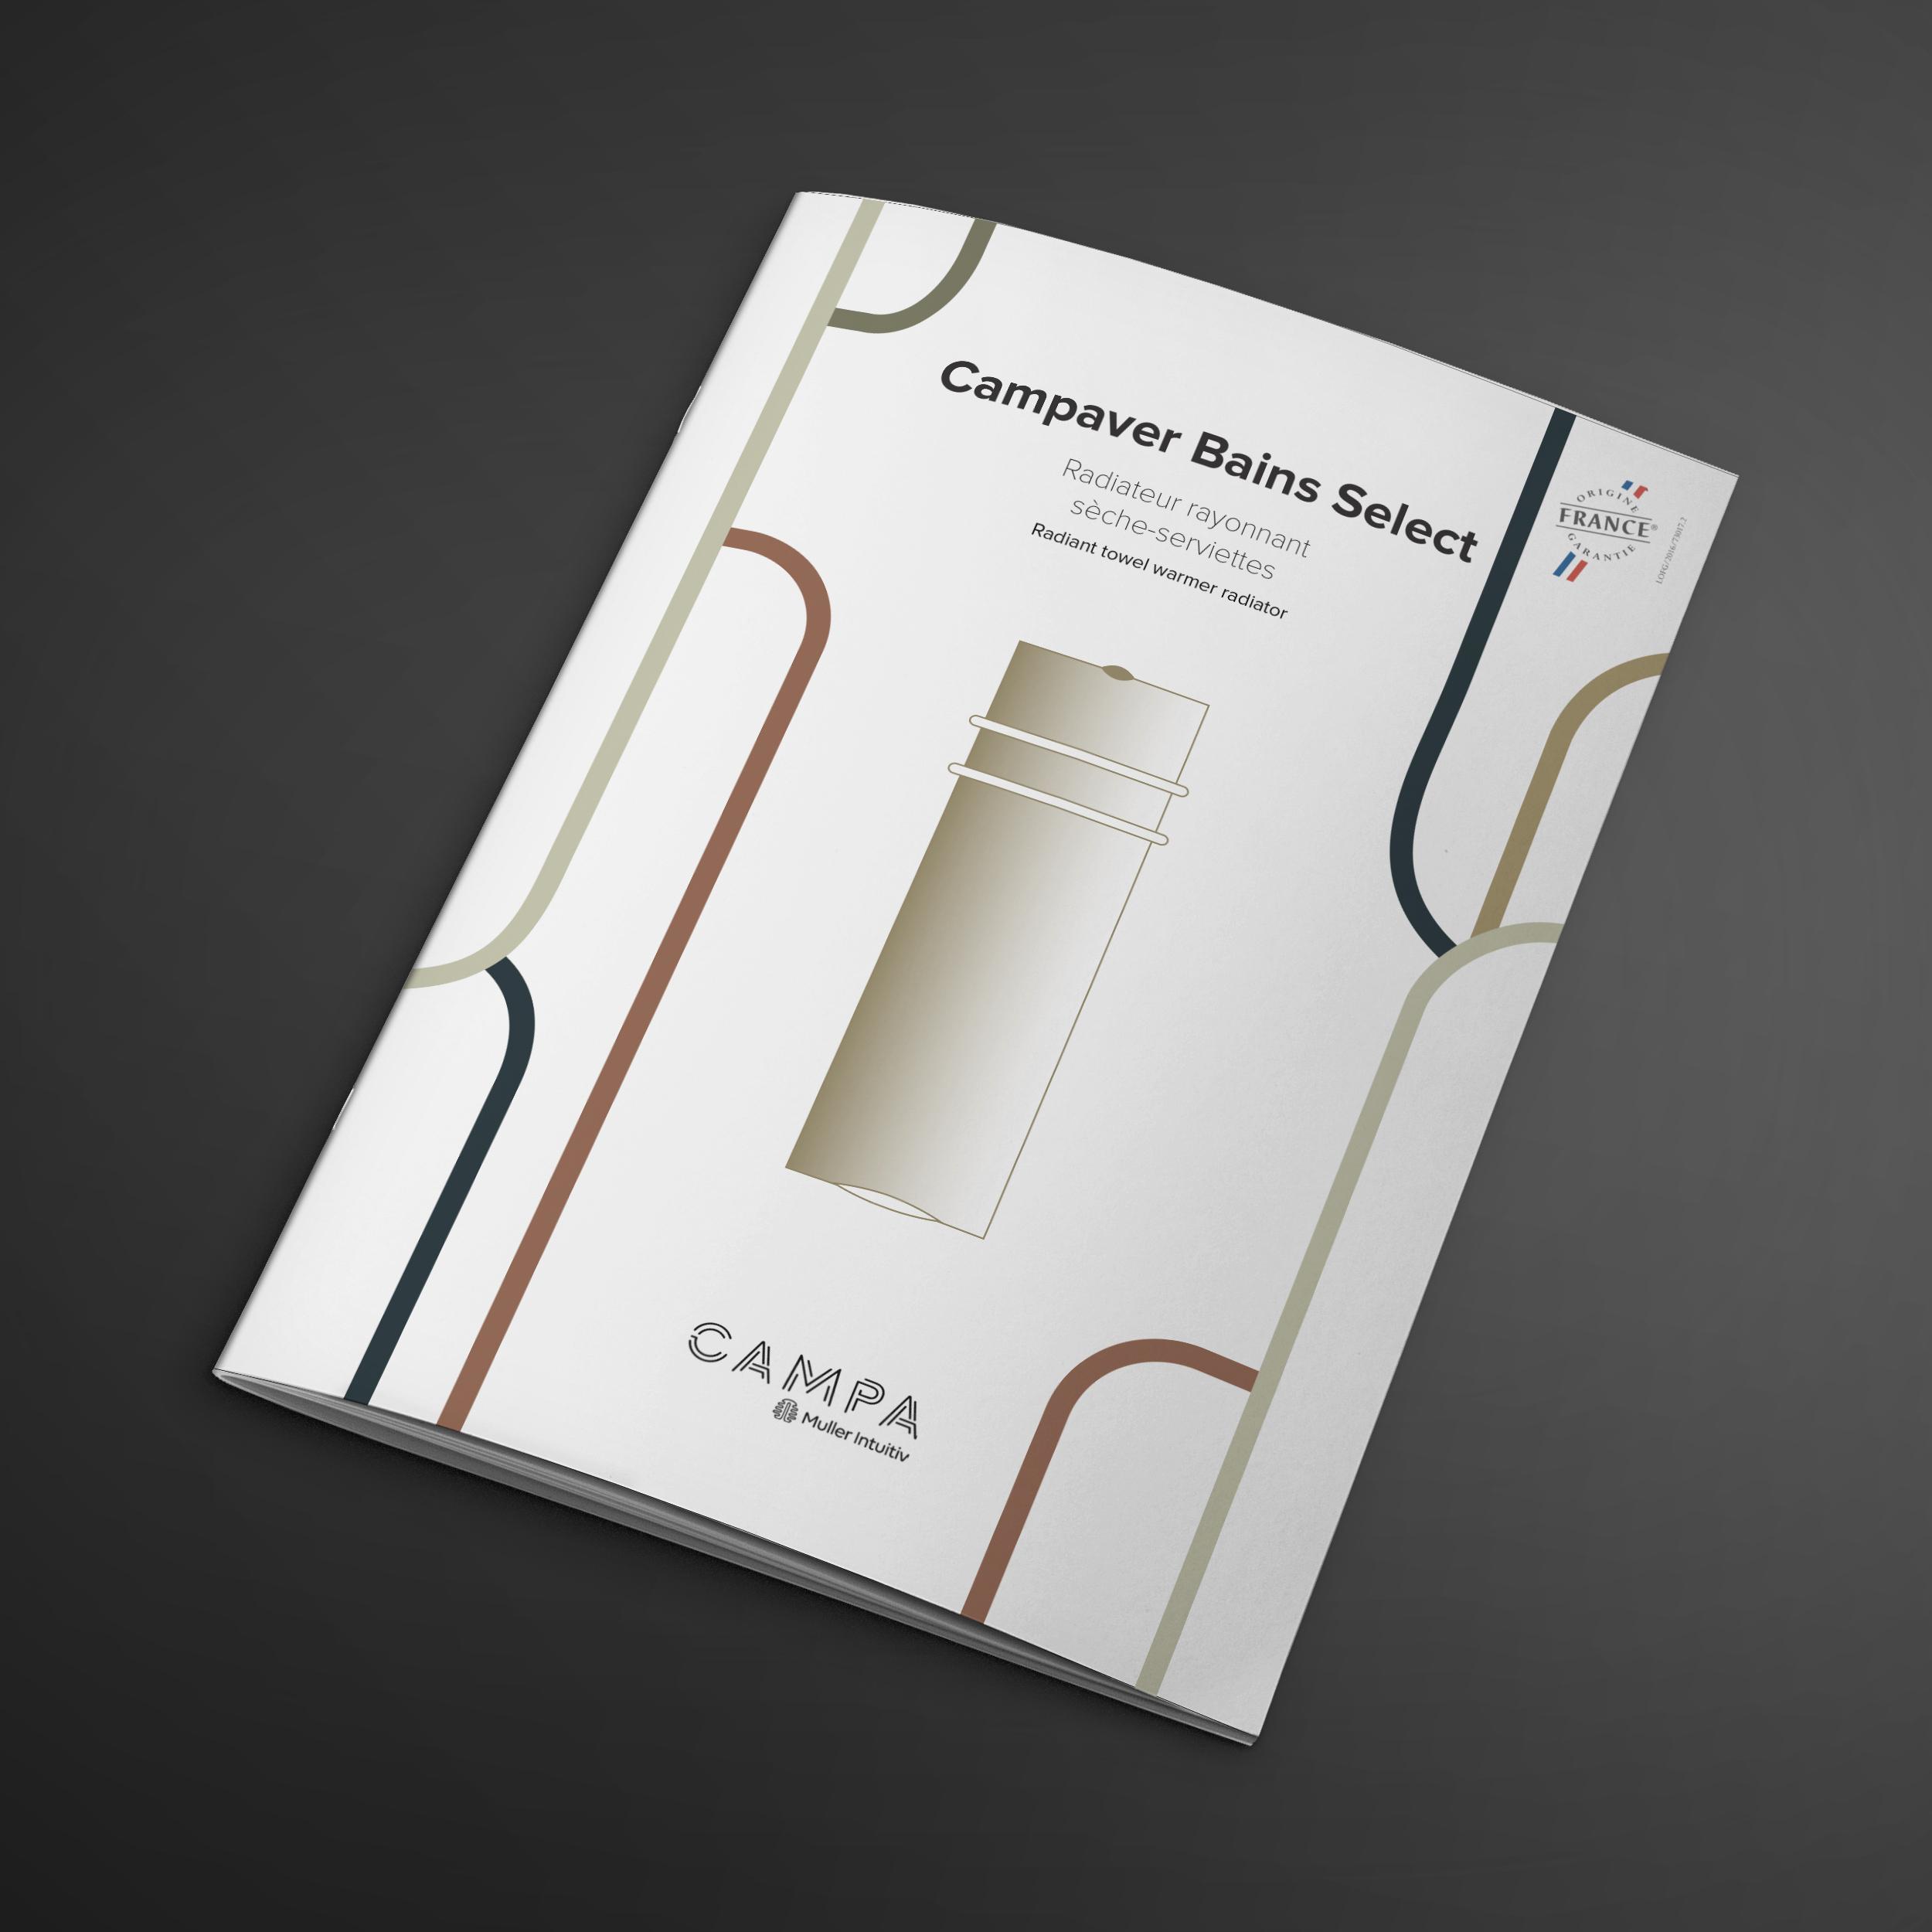 CAMPAVER BAINS SELECT 3.0